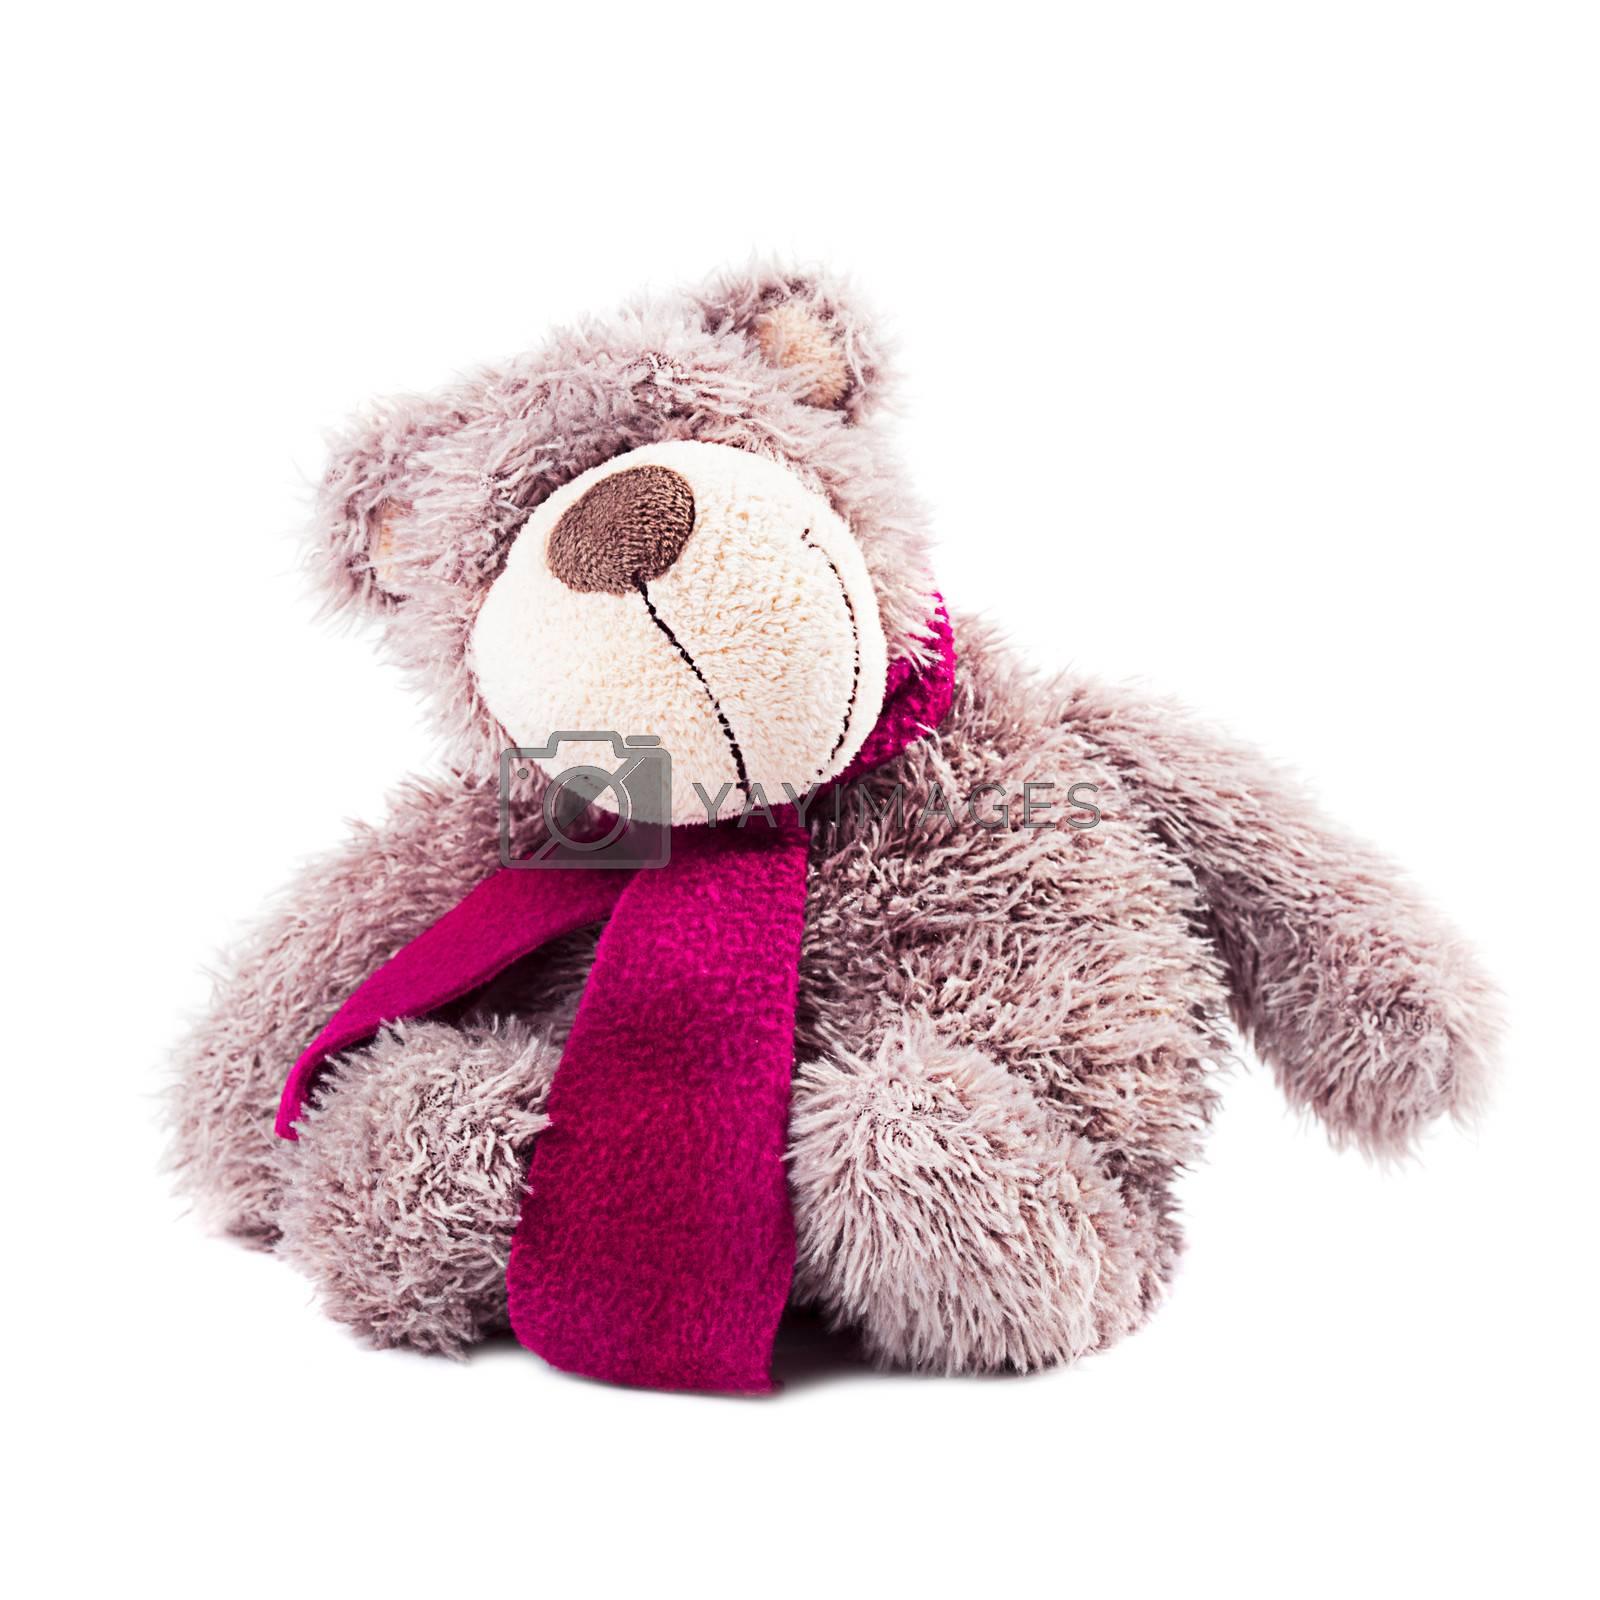 Tebby bear - plush toy, isolated on white